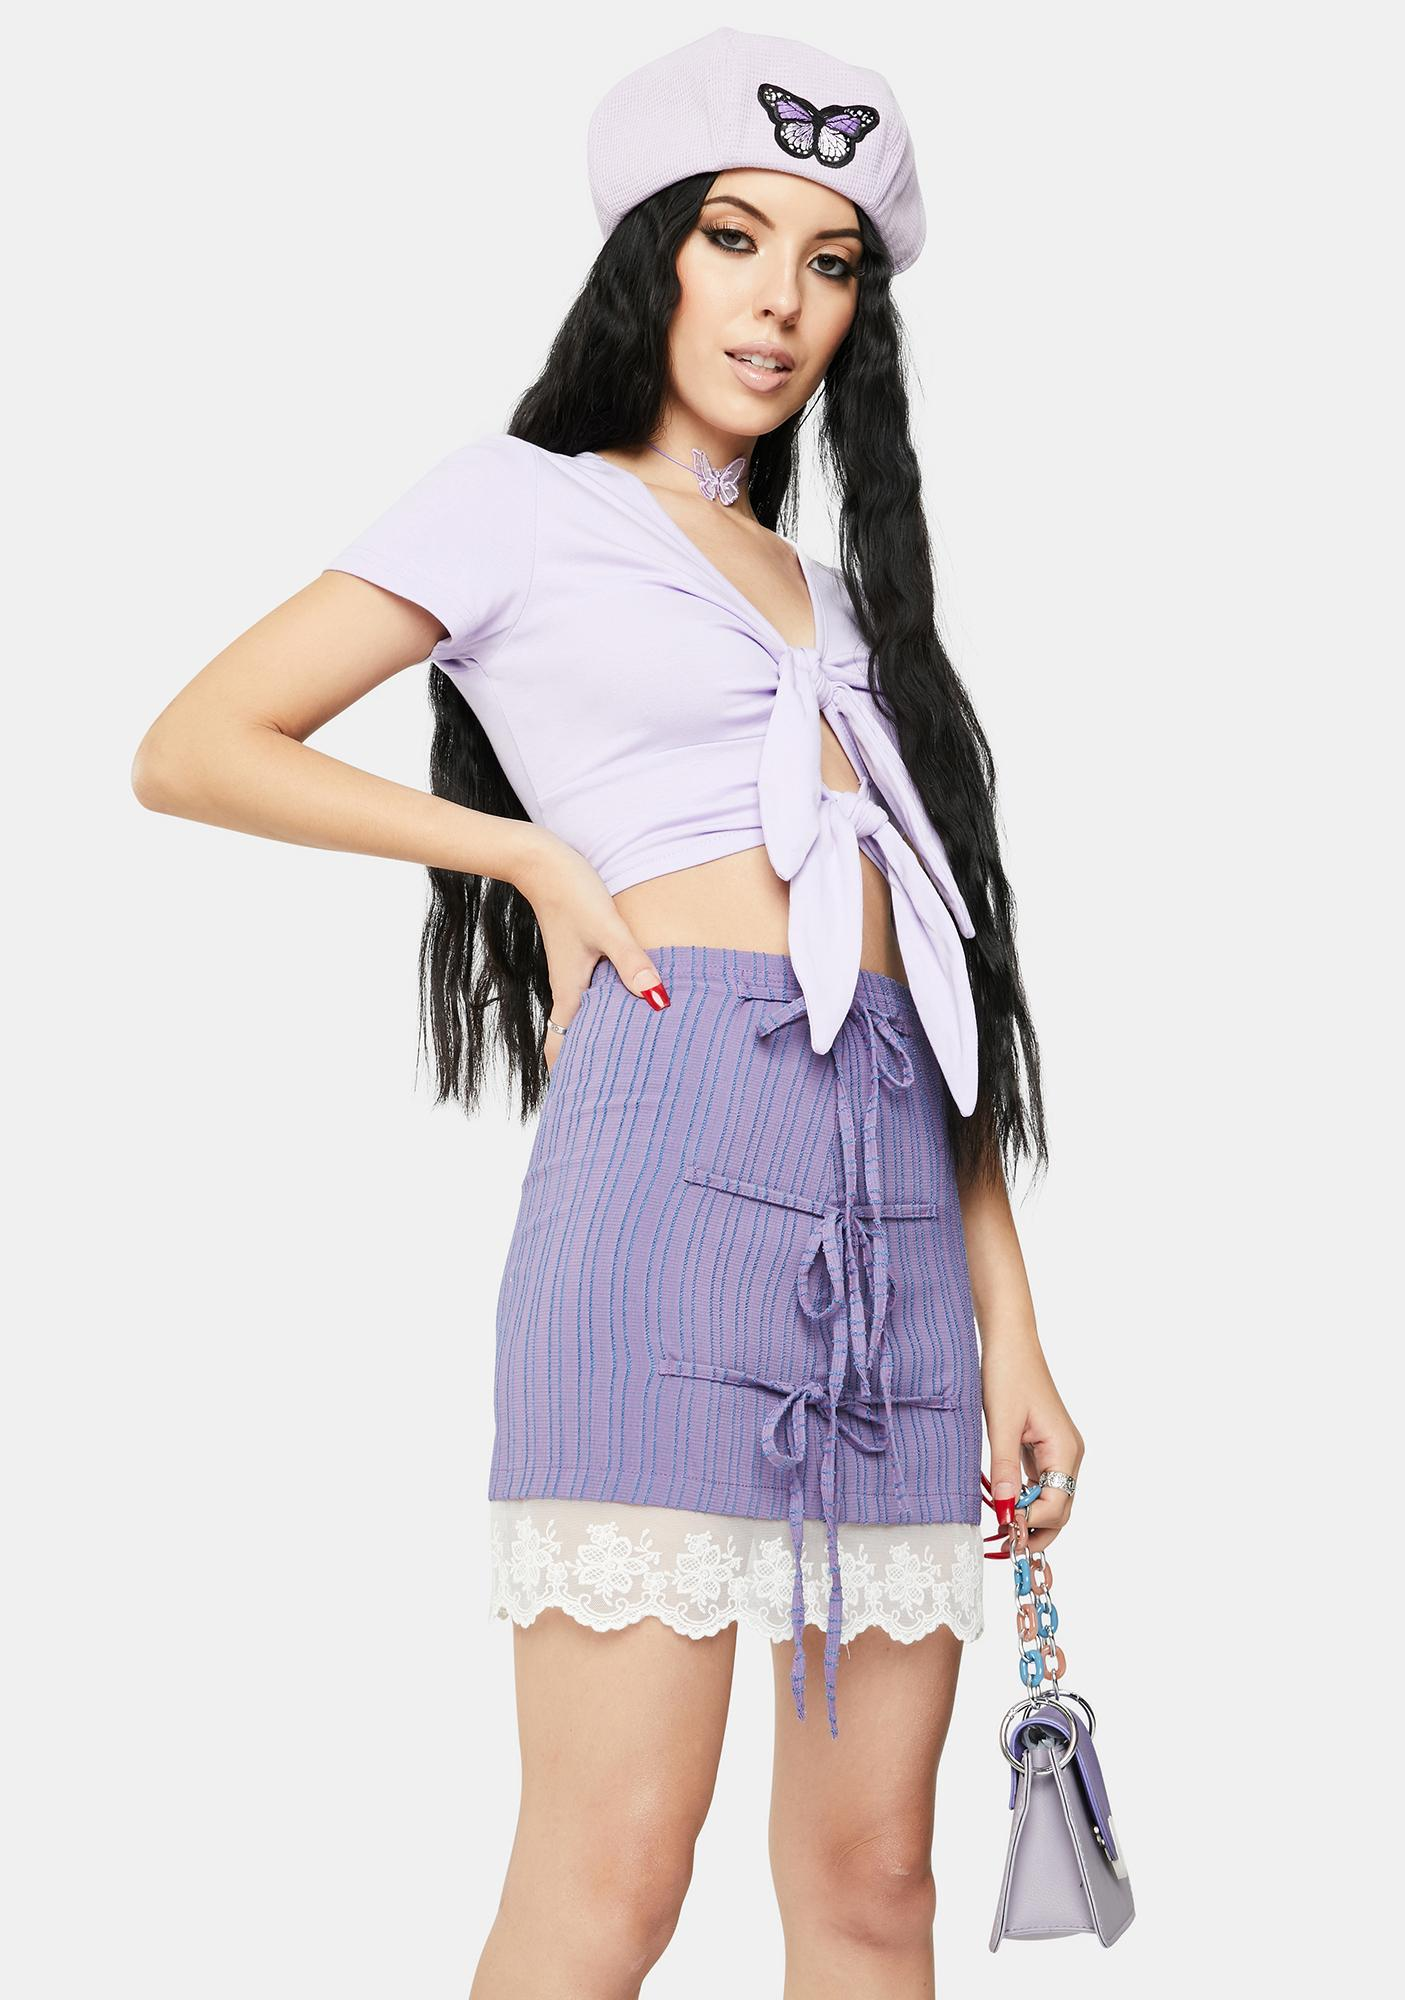 ZEMETA Magnolia Skirt